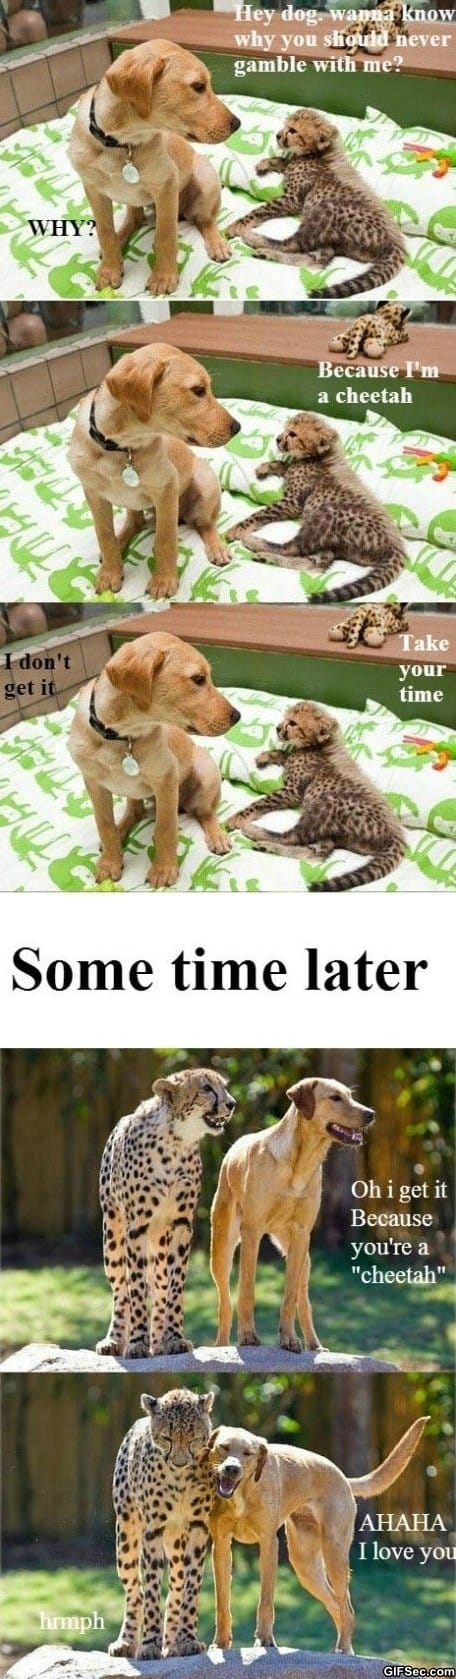 meme-take-your-time